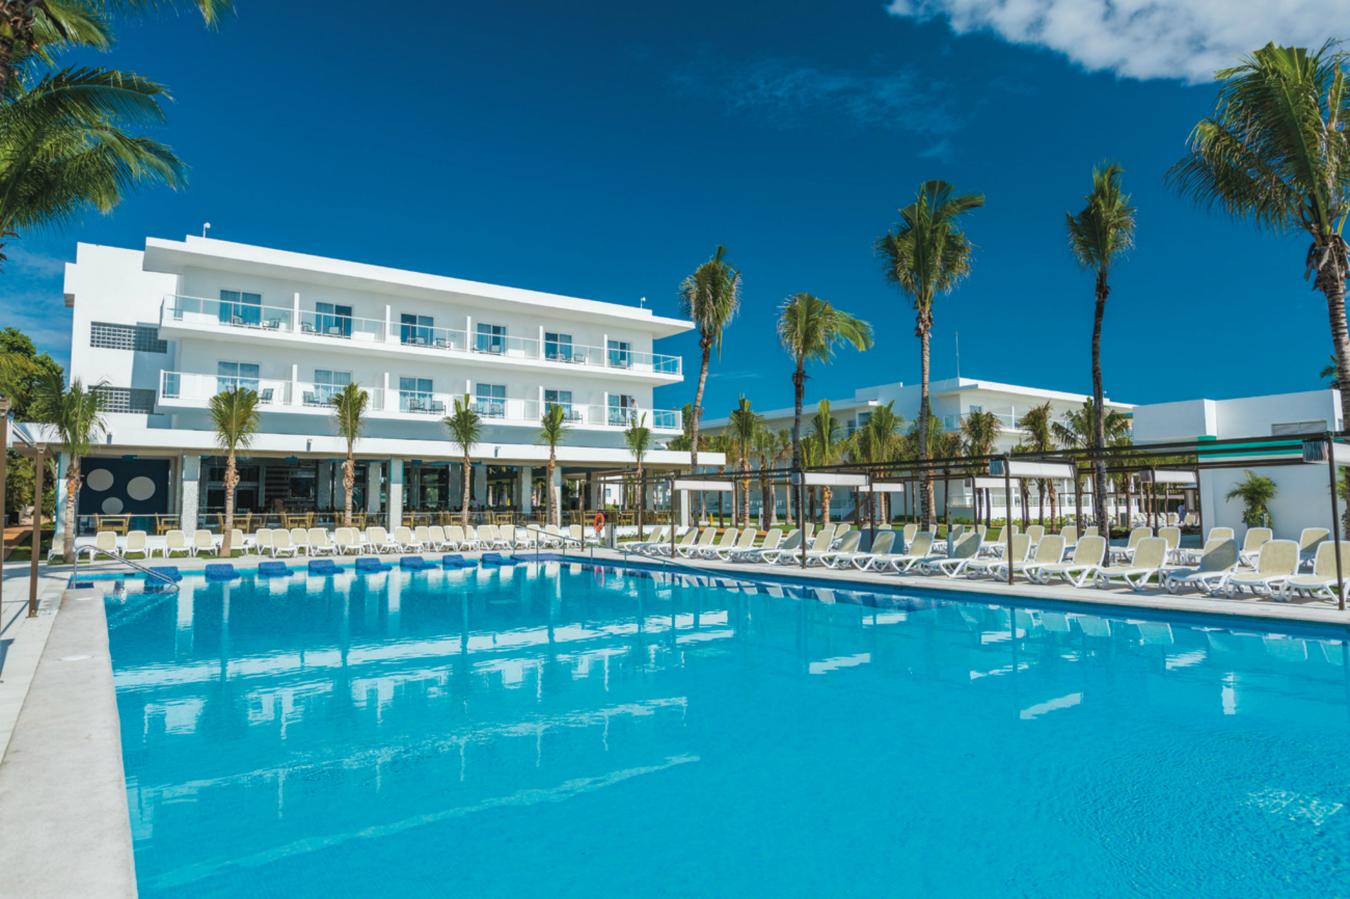 Riu Playacar pool